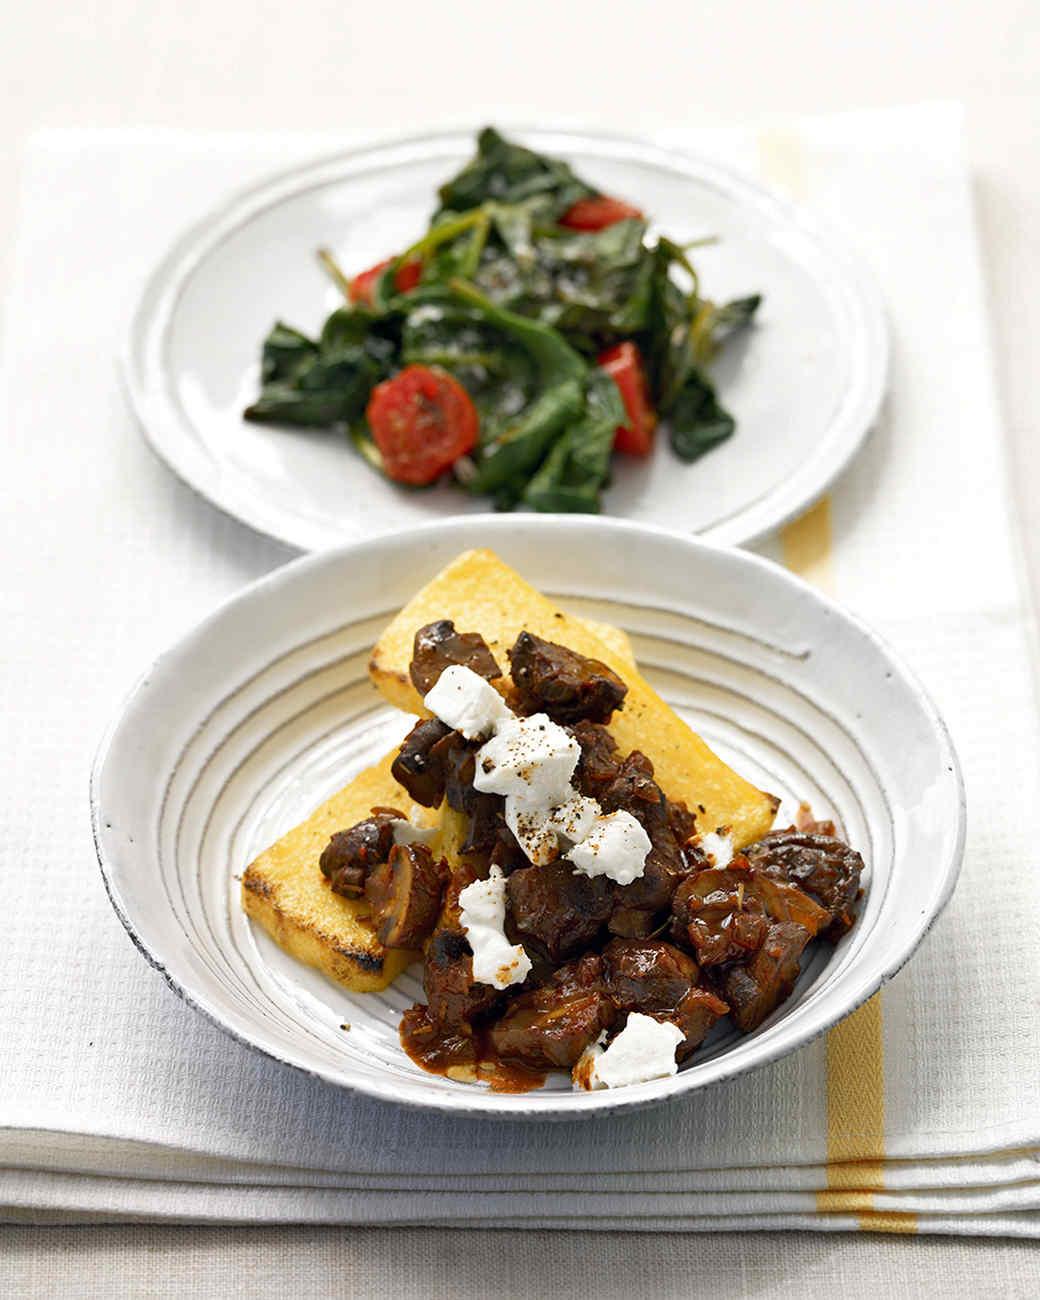 Broiled Polenta with Mushroom Ragout